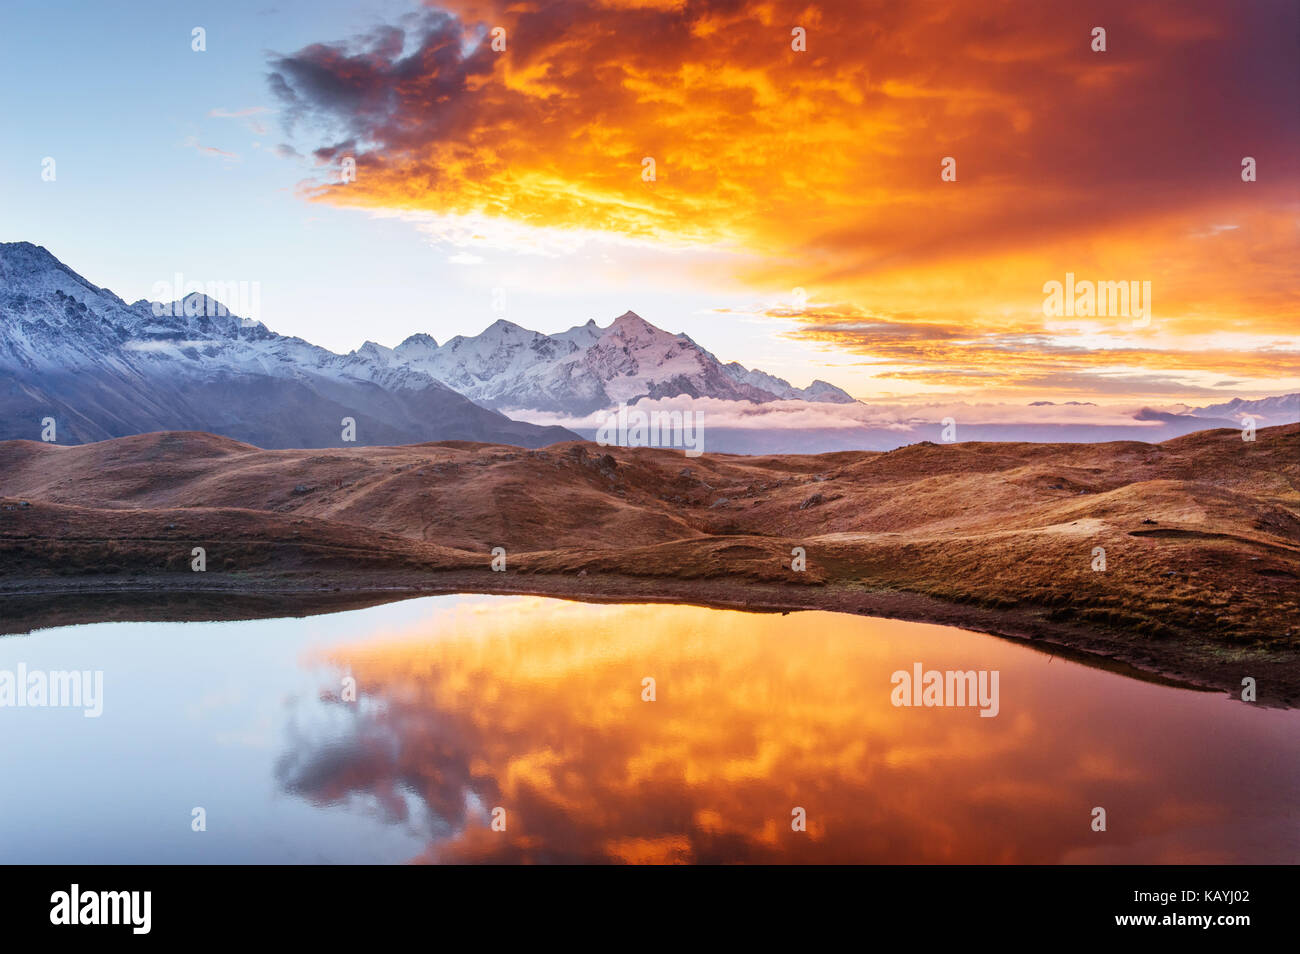 Bergsee. Schönen Sonnenaufgang. Morgen Landschaft. Koruldi See. Main kaukasischen Ridge Stockbild